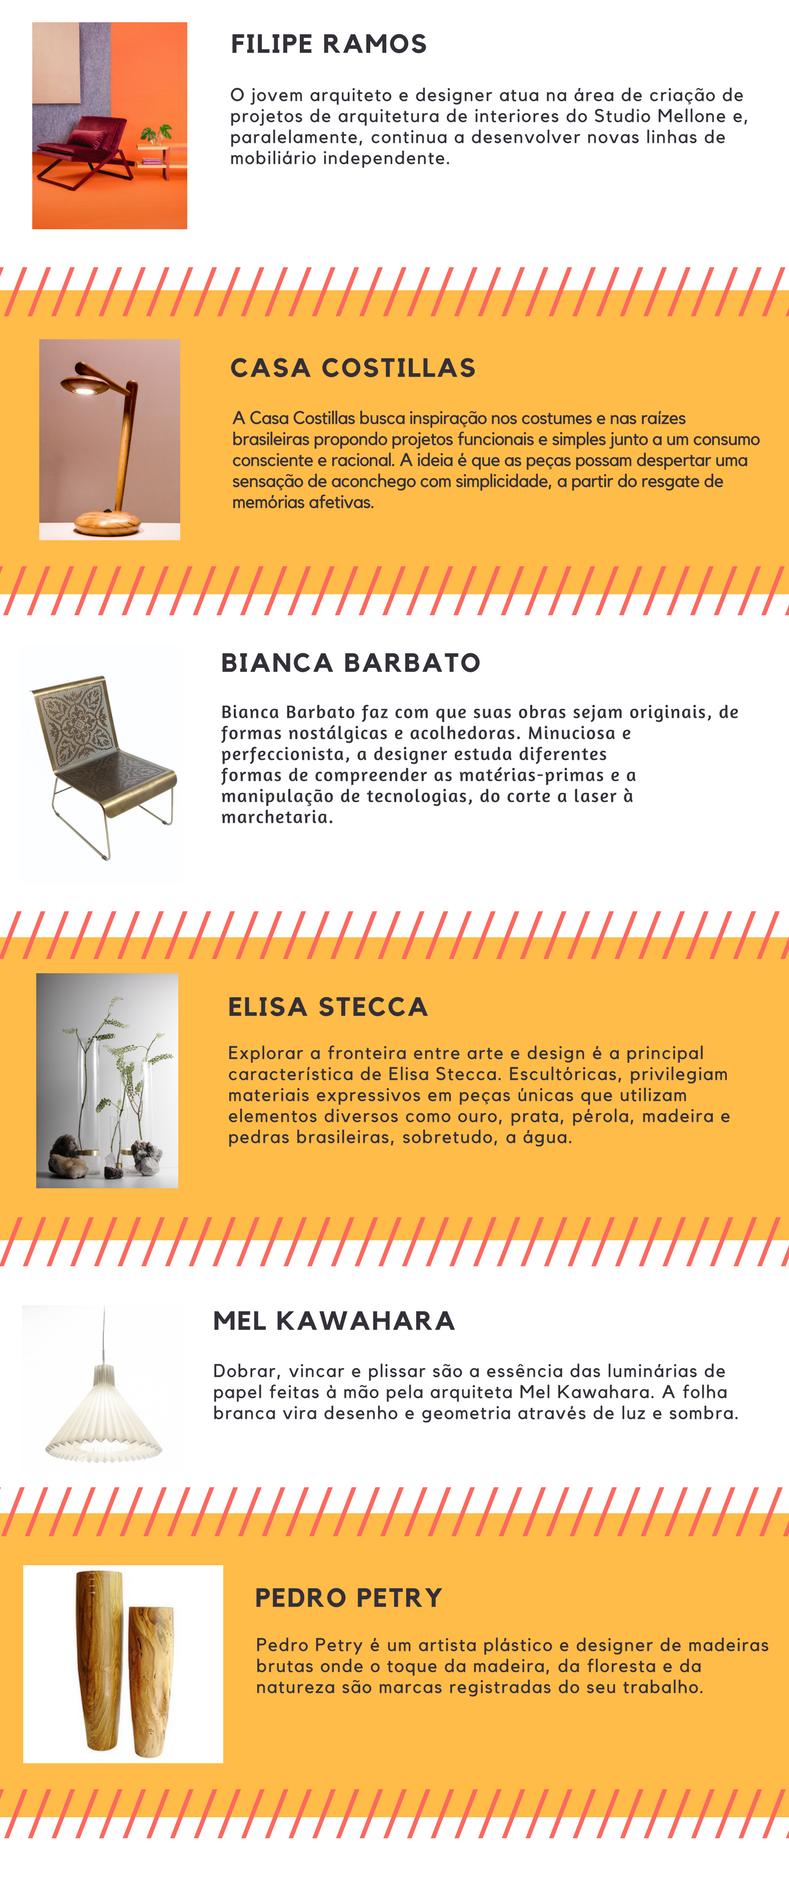 feira-paralela-design-2018-expositores-4